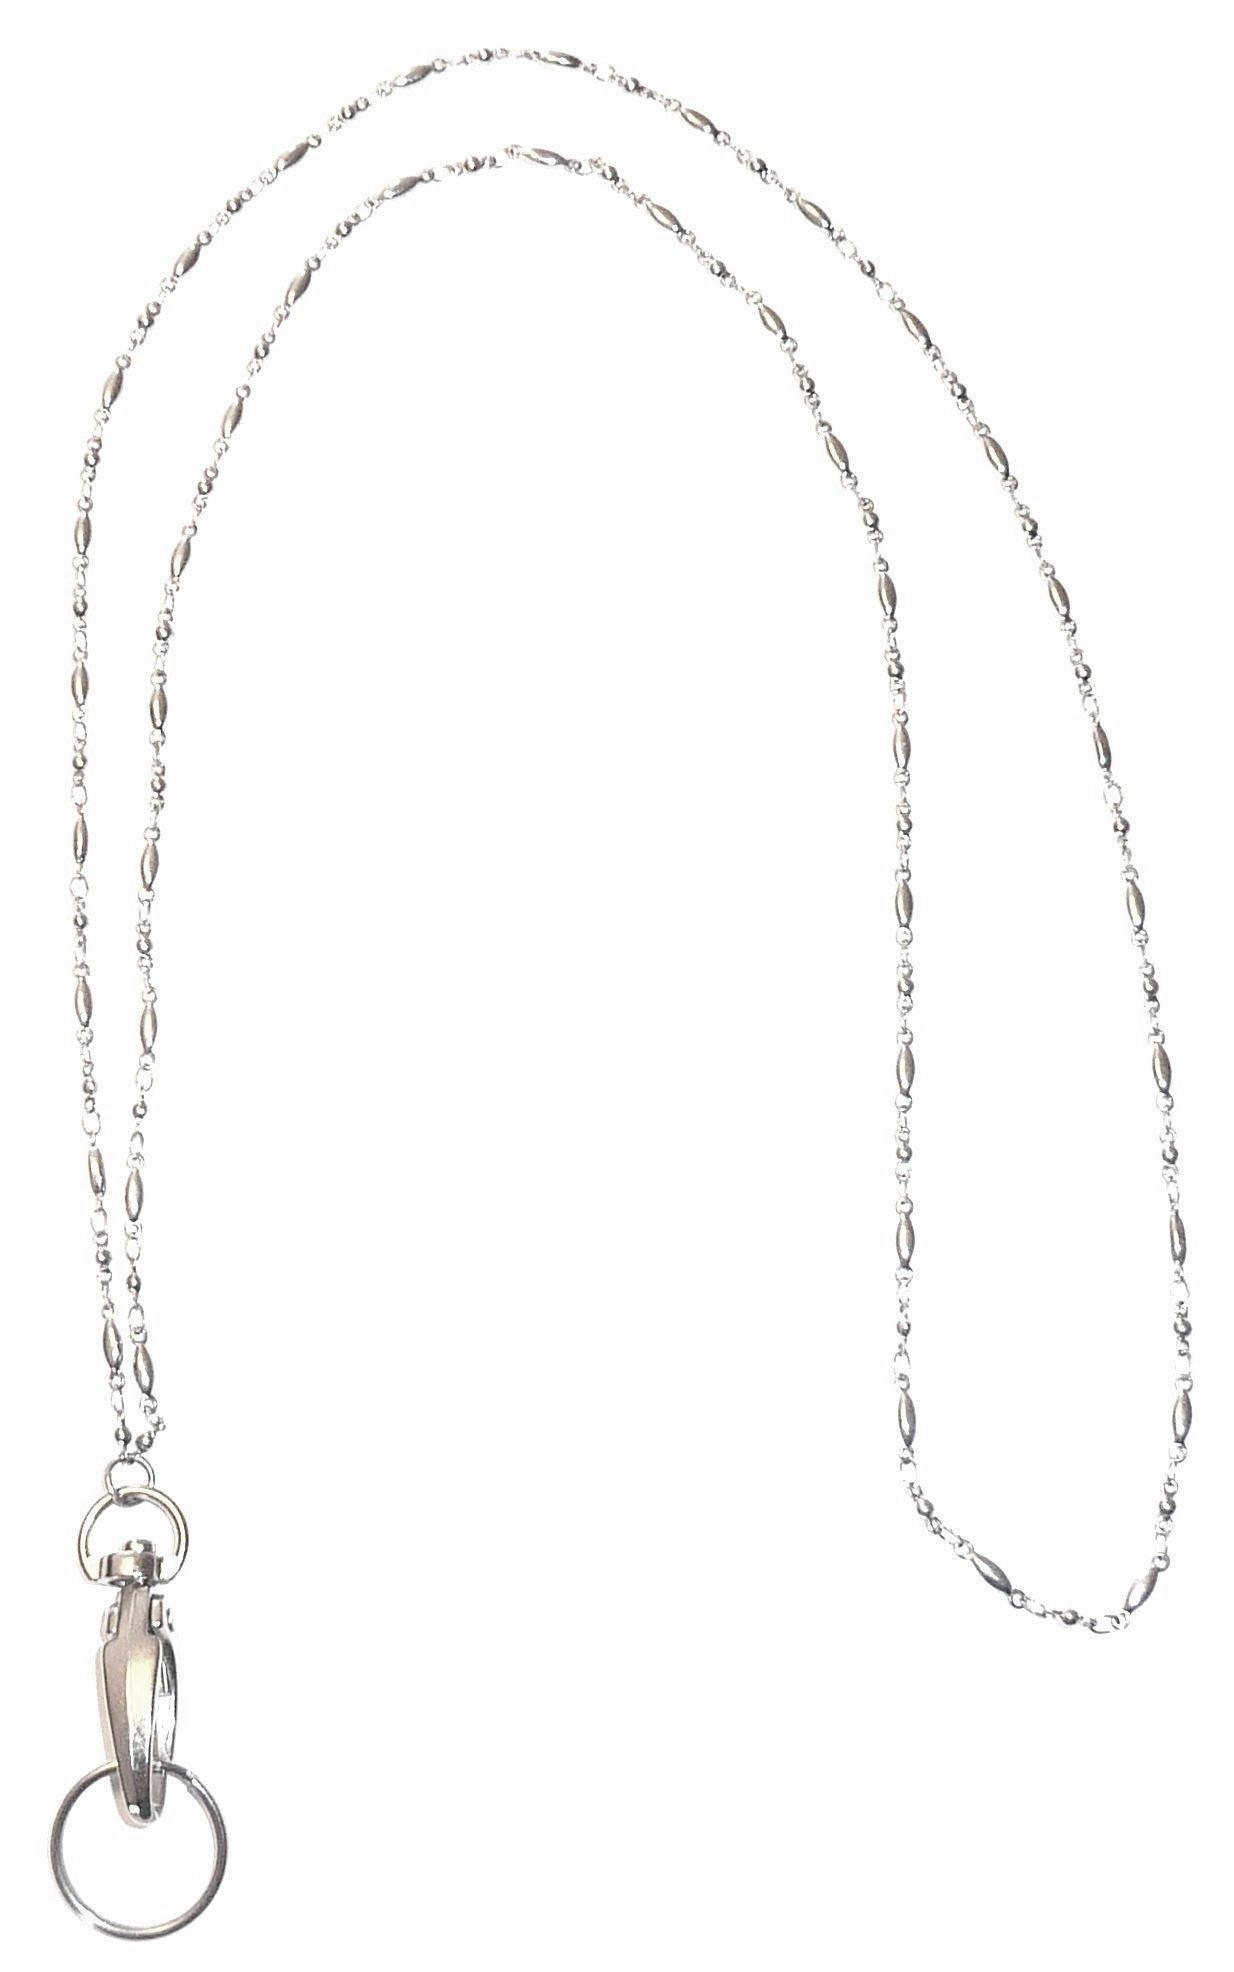 Hidden Hollow Beads Women's strong lanyard Non Breakaway - Stronger (Stainless Steel)